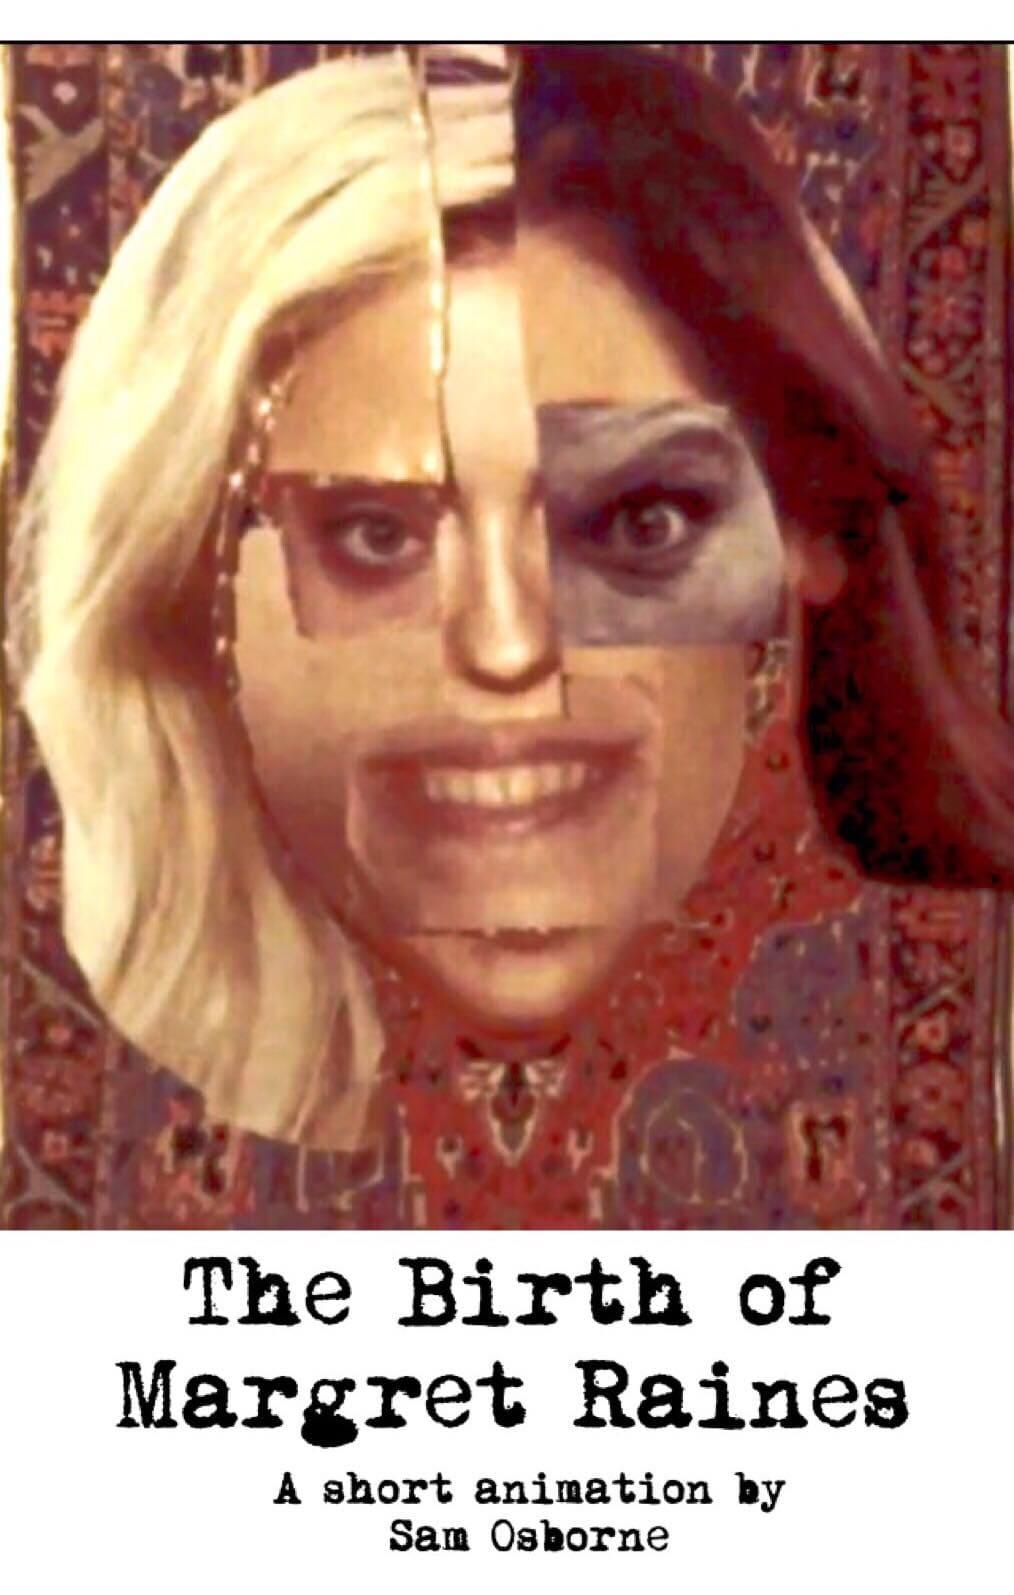 The Birth of Margret Raines